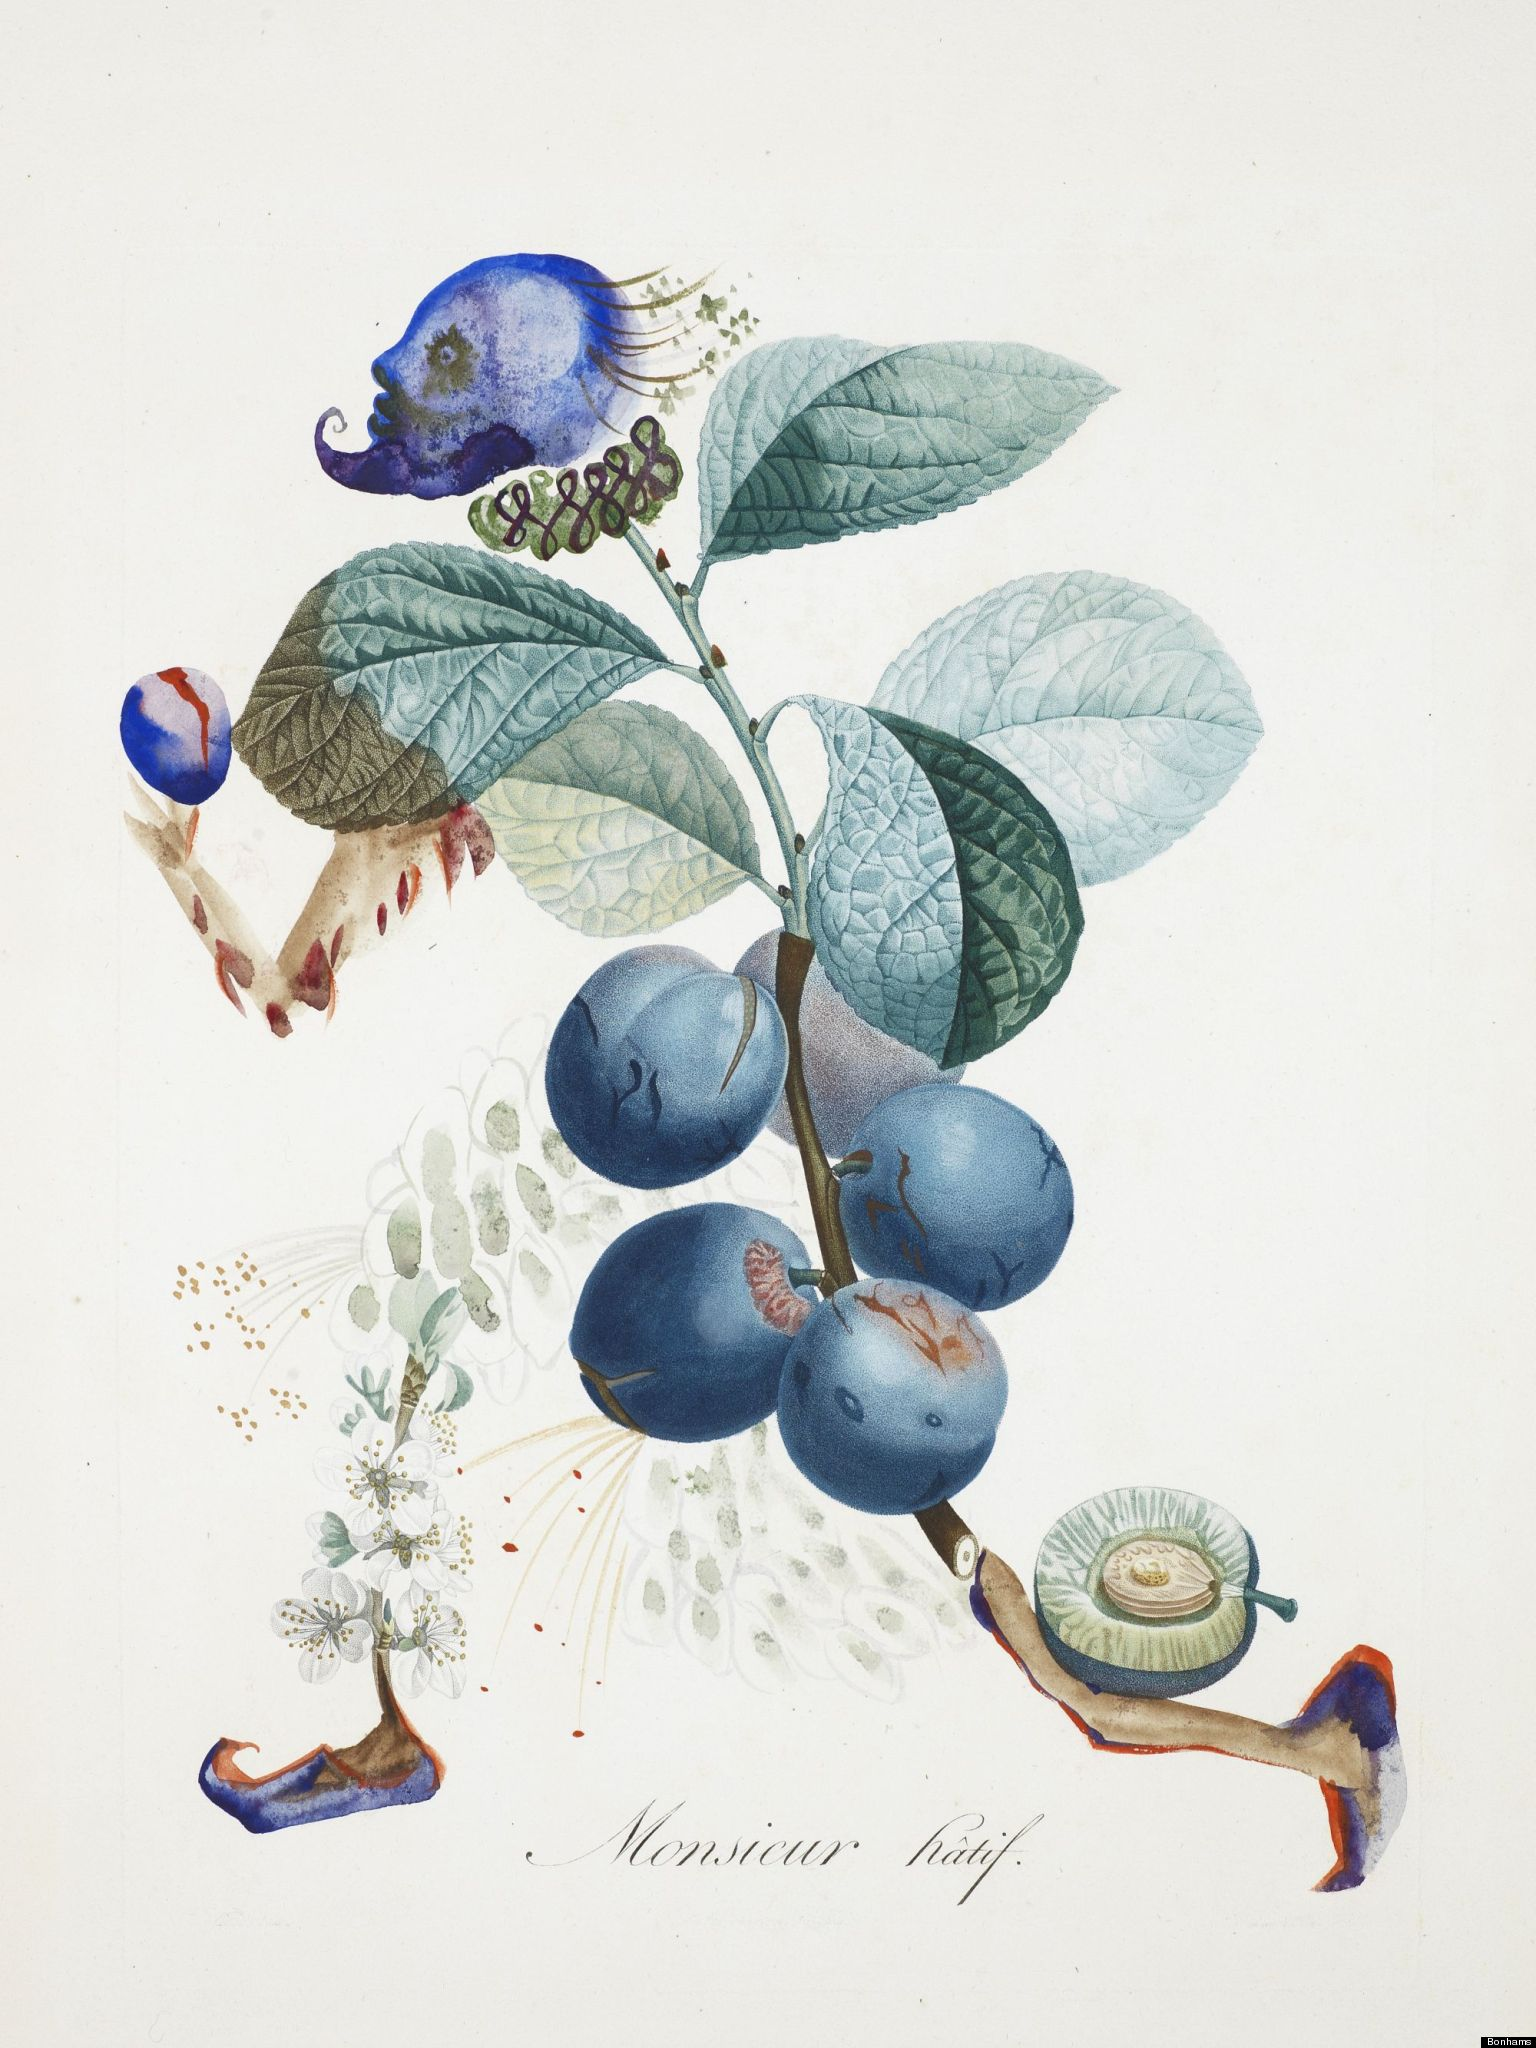 Dali Auction: Hidden Botanical Watercolors Head To Bonham ... | 1536 x 2048 jpeg 310kB